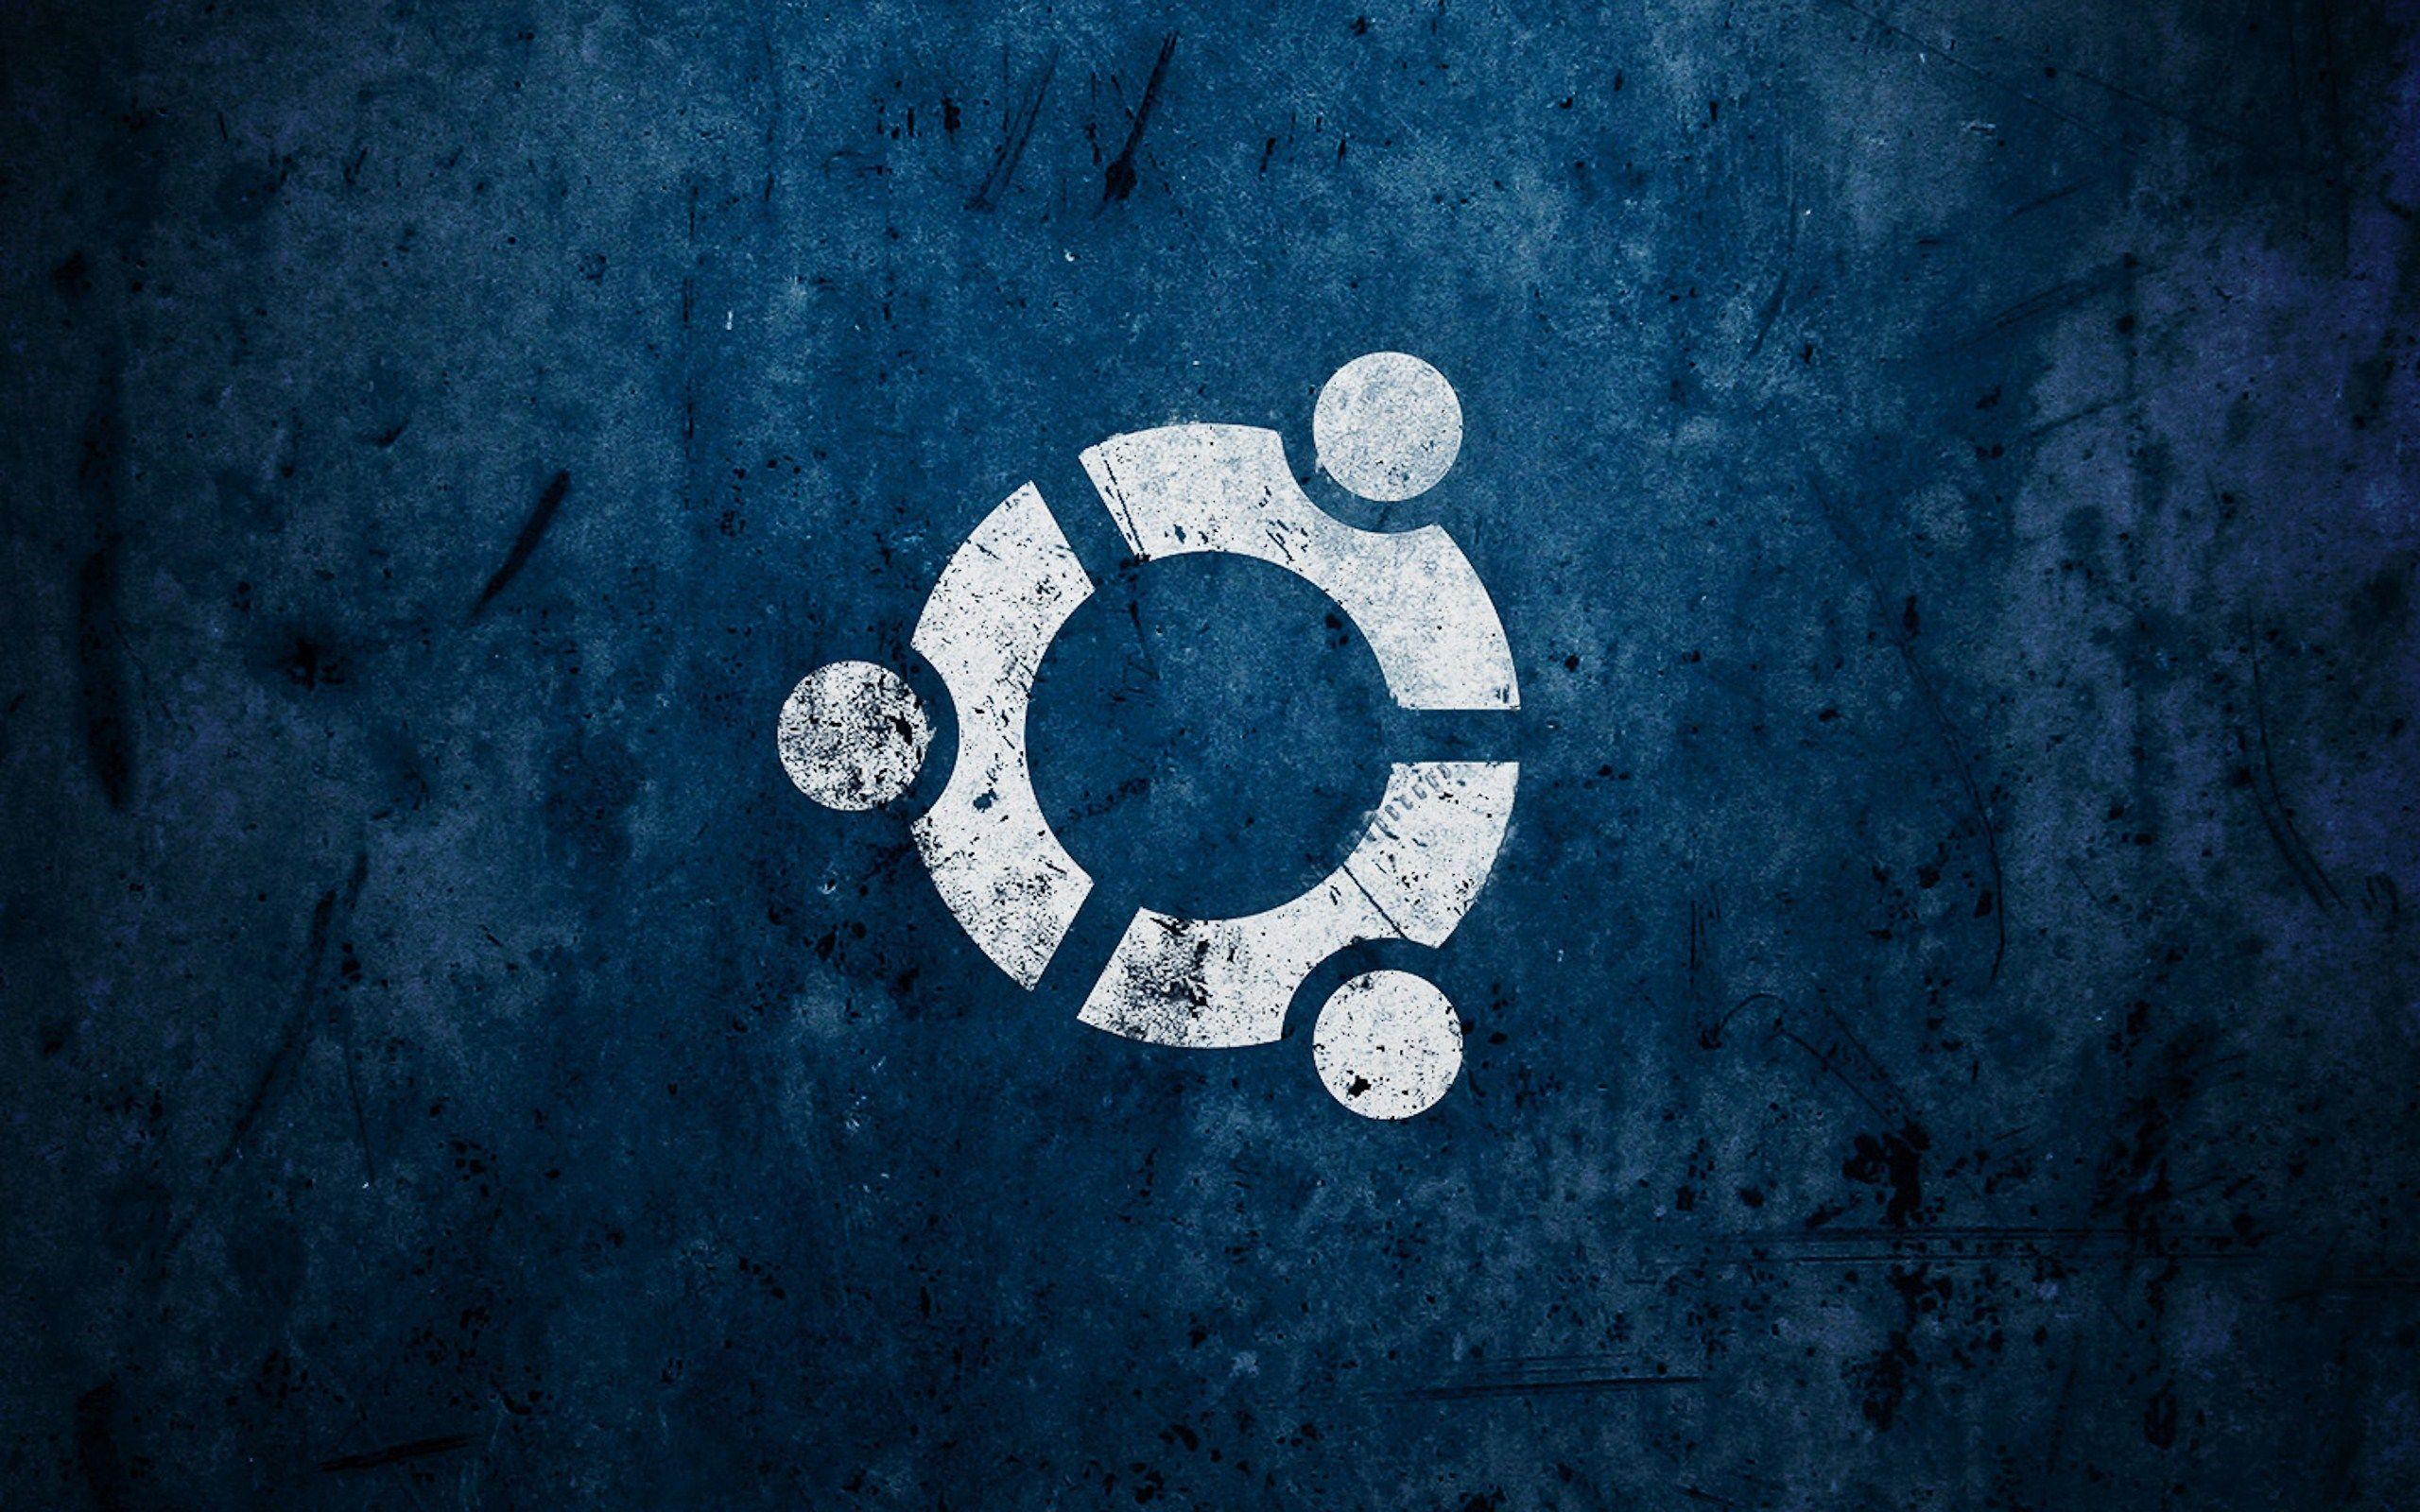 لینوکسی شو : مدیریت فایل ها و فولدرها در اوبونتو